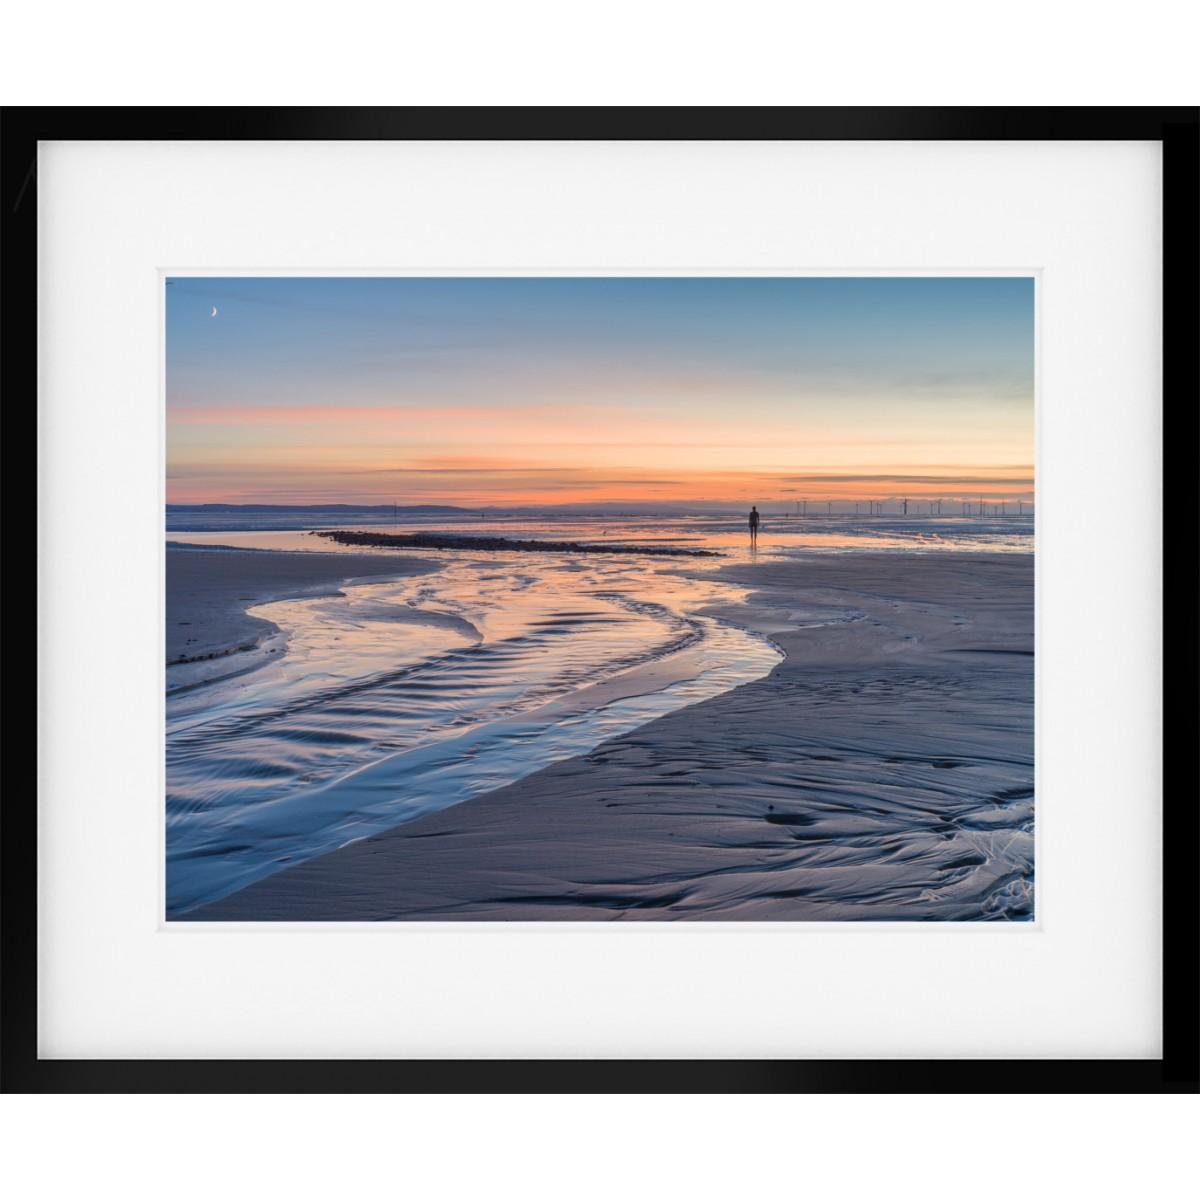 Crosby Beach Sunset Framed Print